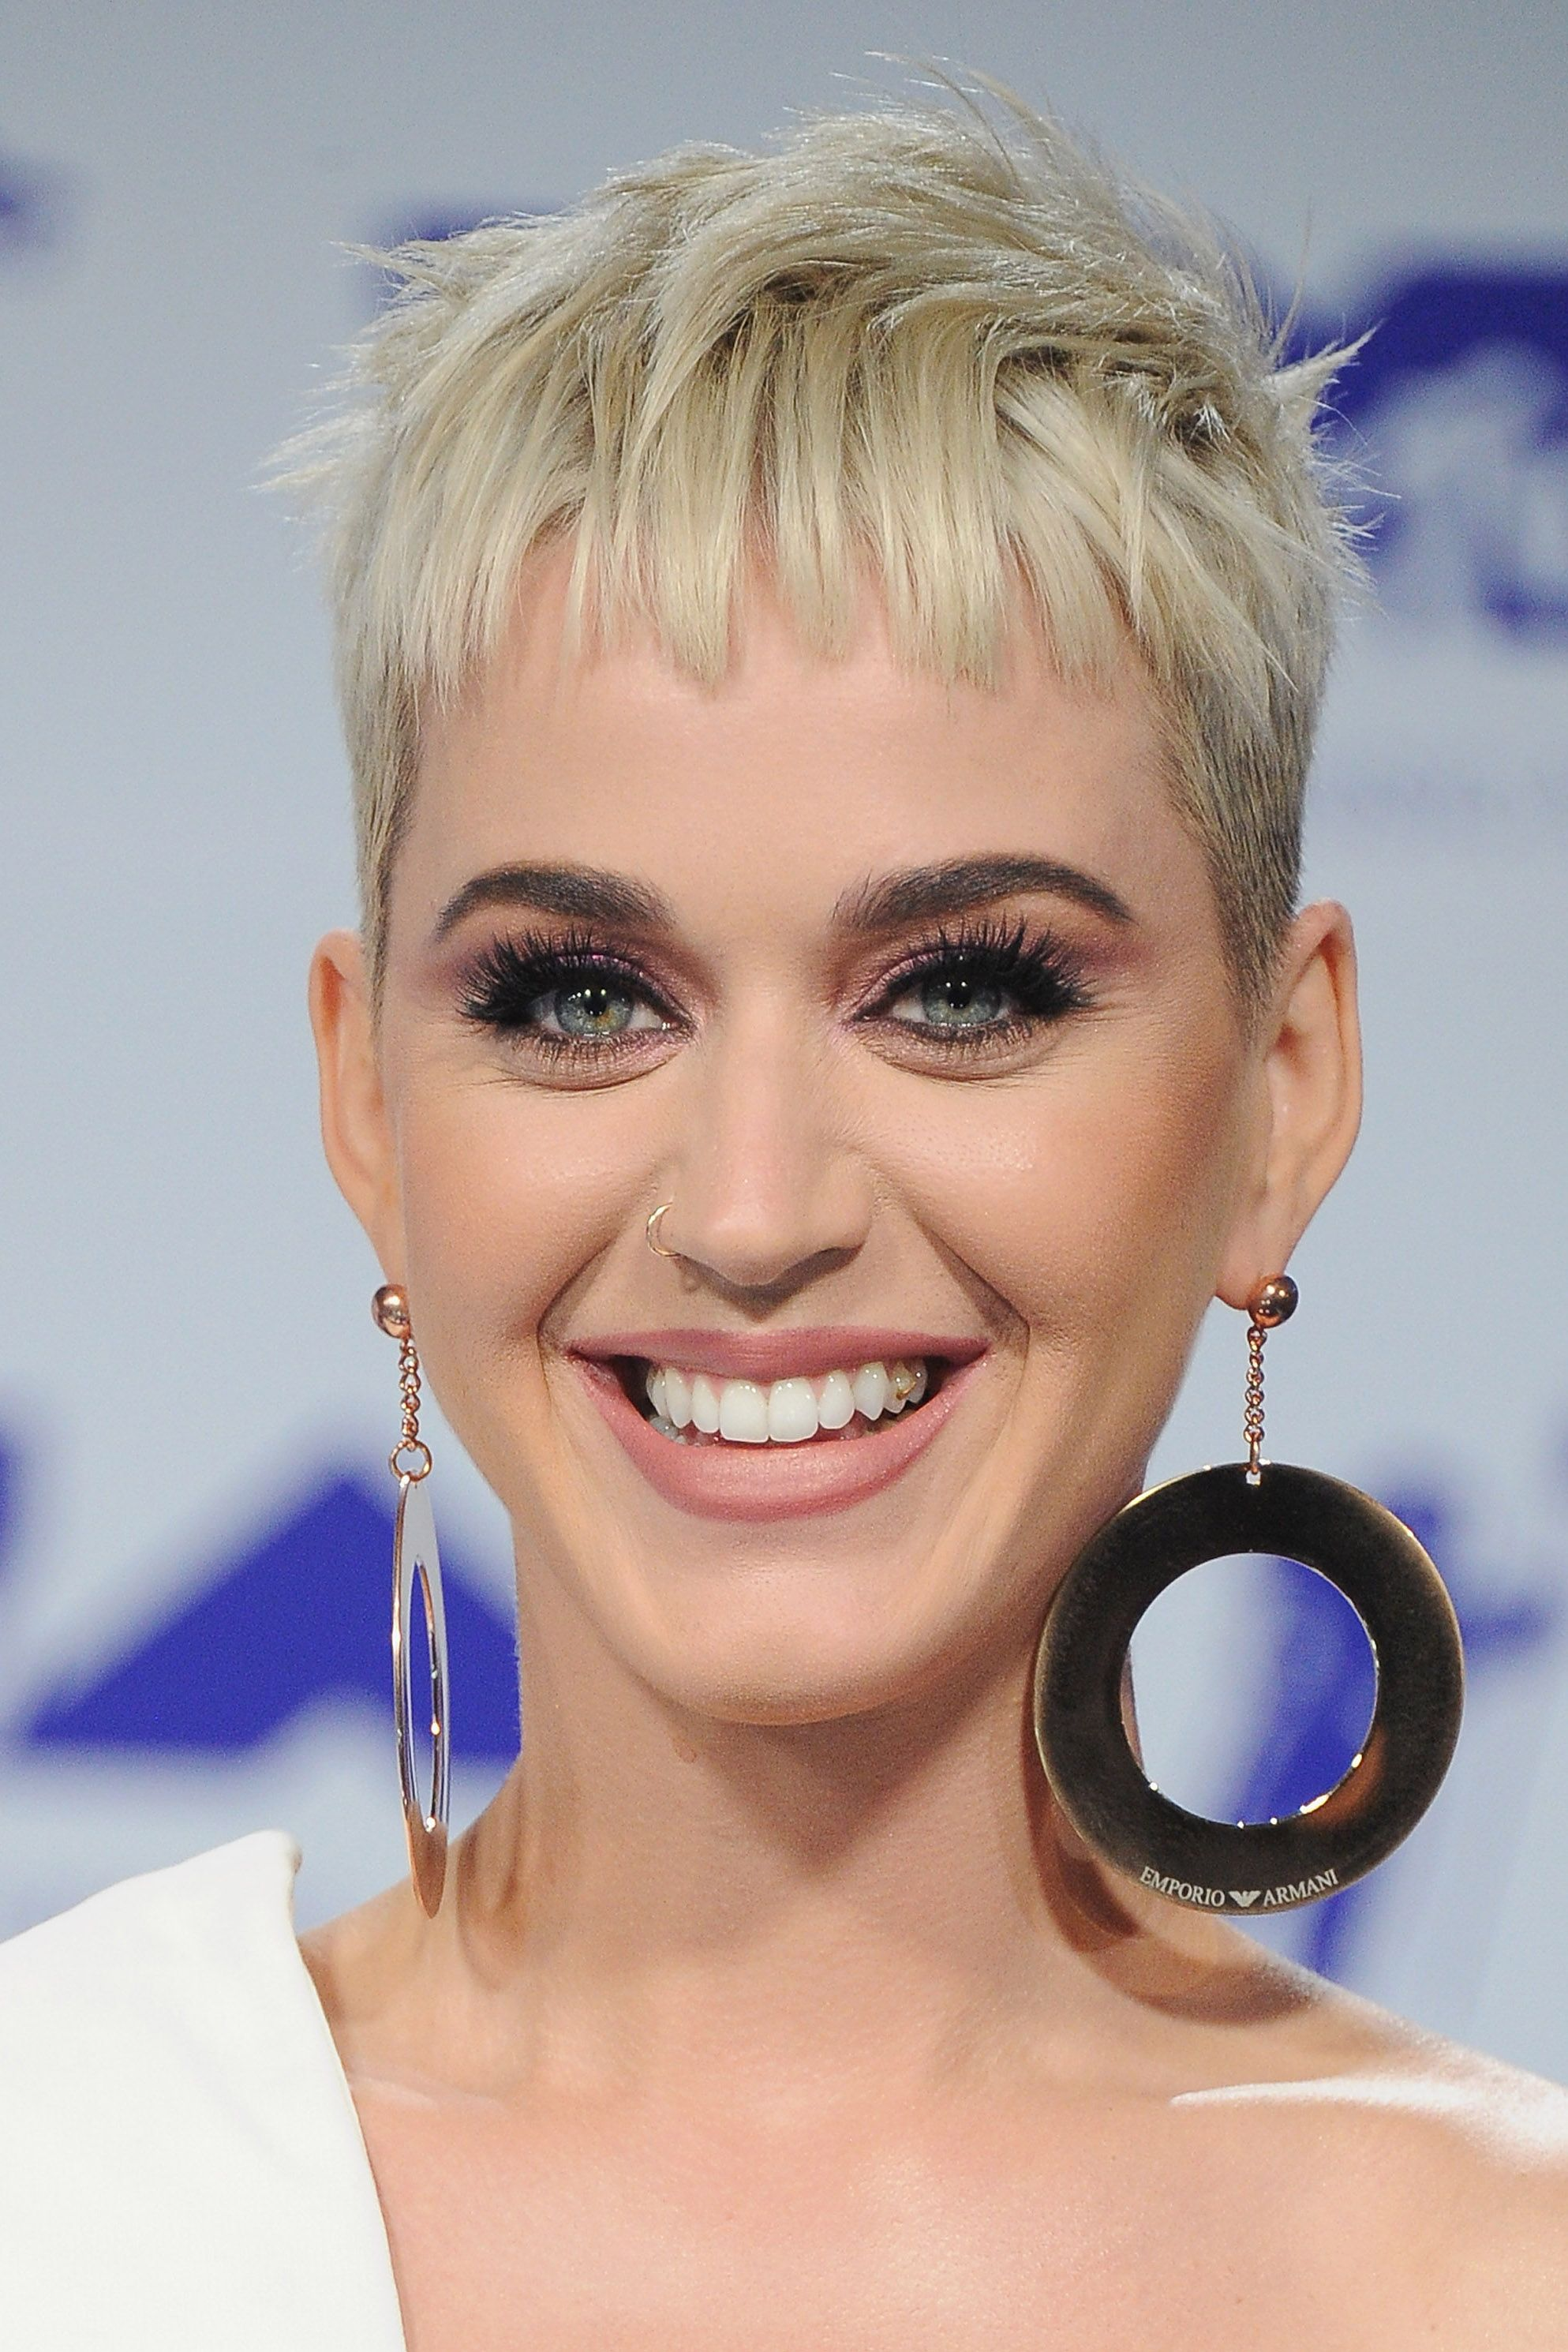 Katy Perry - Cute Blonde Hair Color Ideas